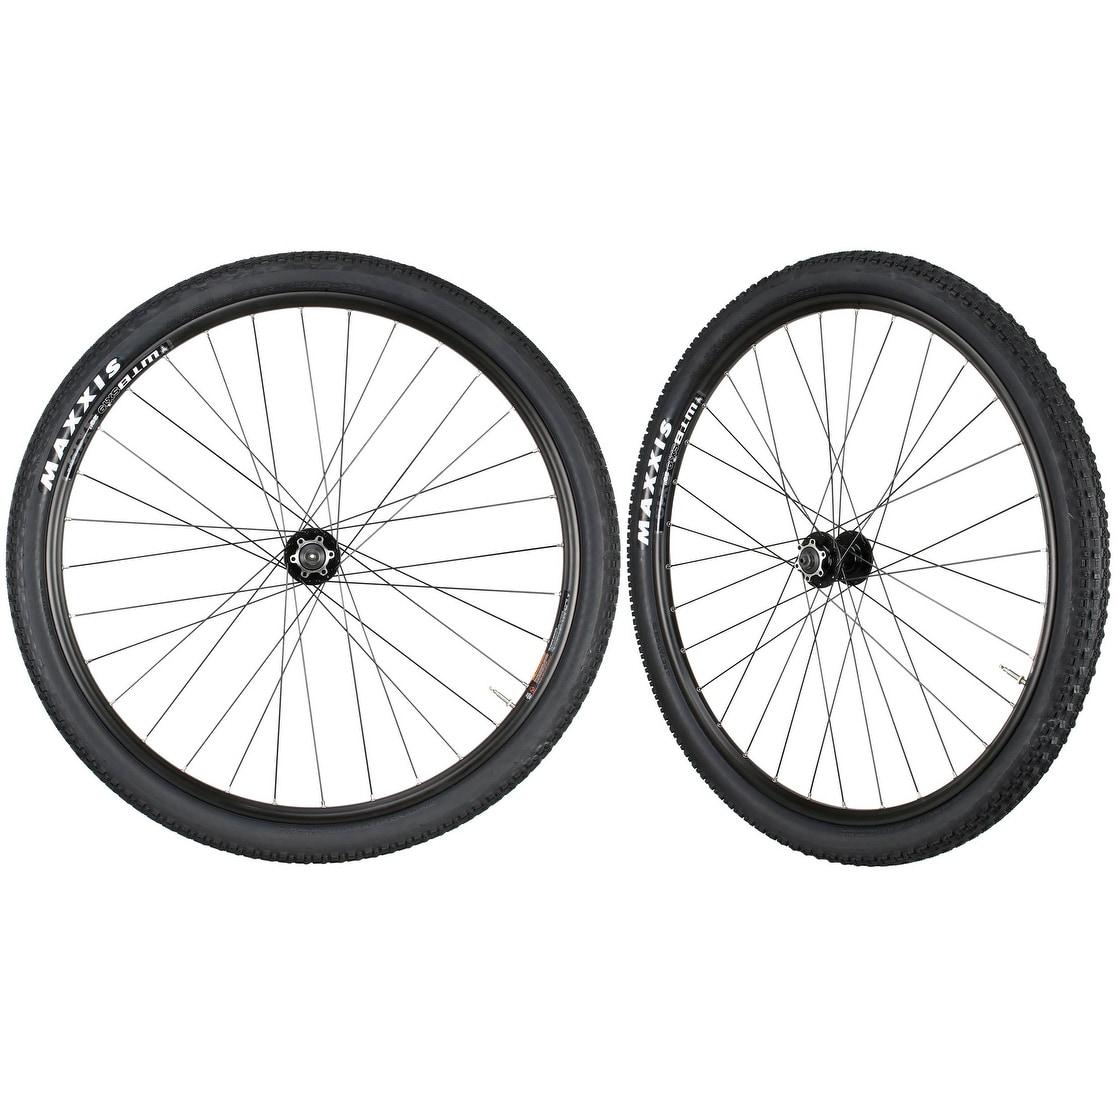 "WTB SX19 Mountain Bike Bicycle Novatec Hubs /& Tyres Wheelset 11s 26/"" QR"